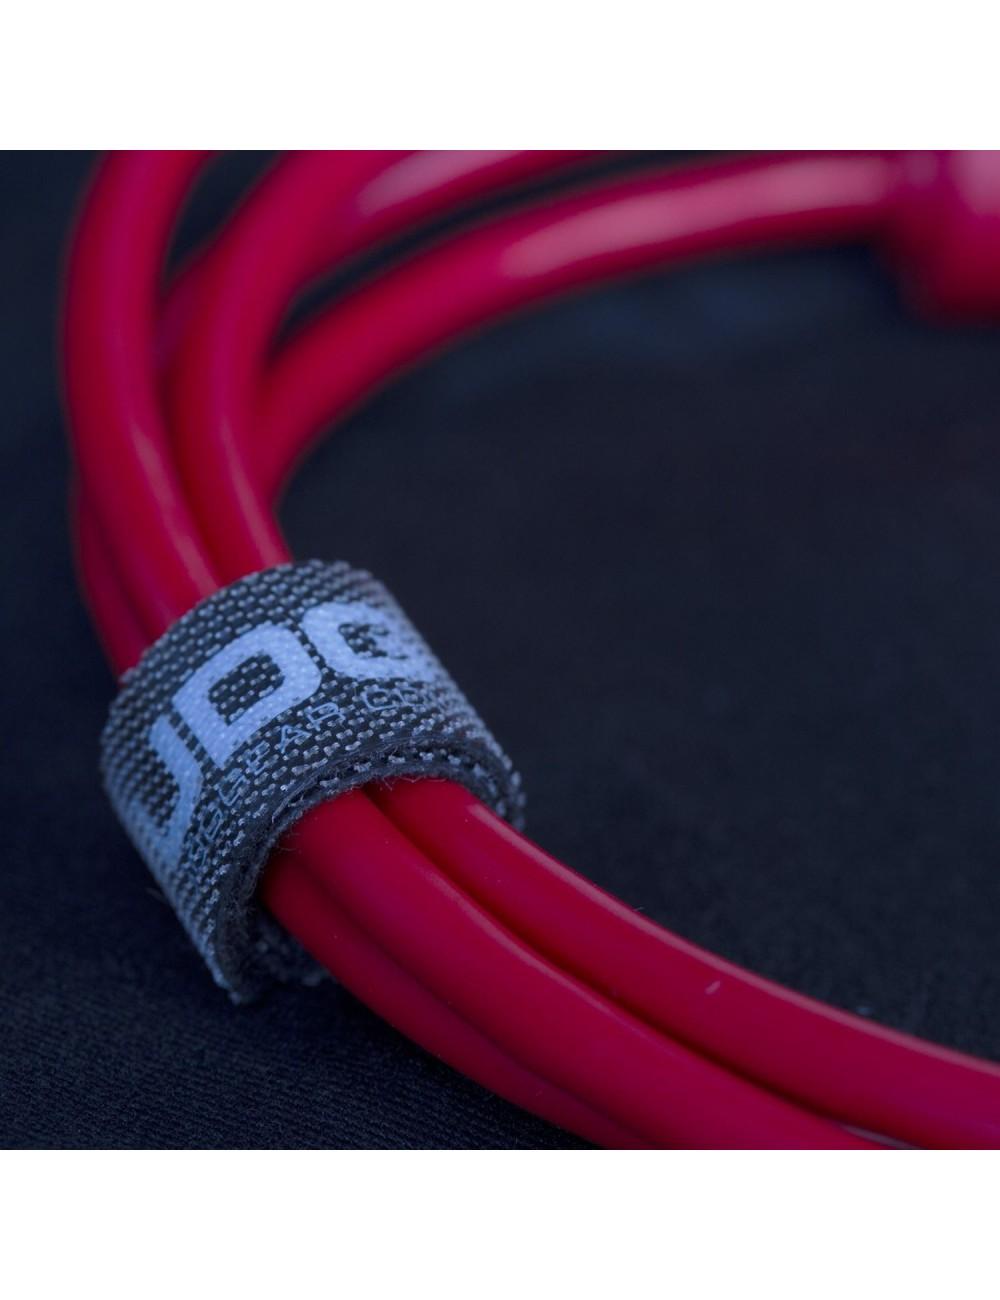 Focusrite USB AUDIO INTERFACE